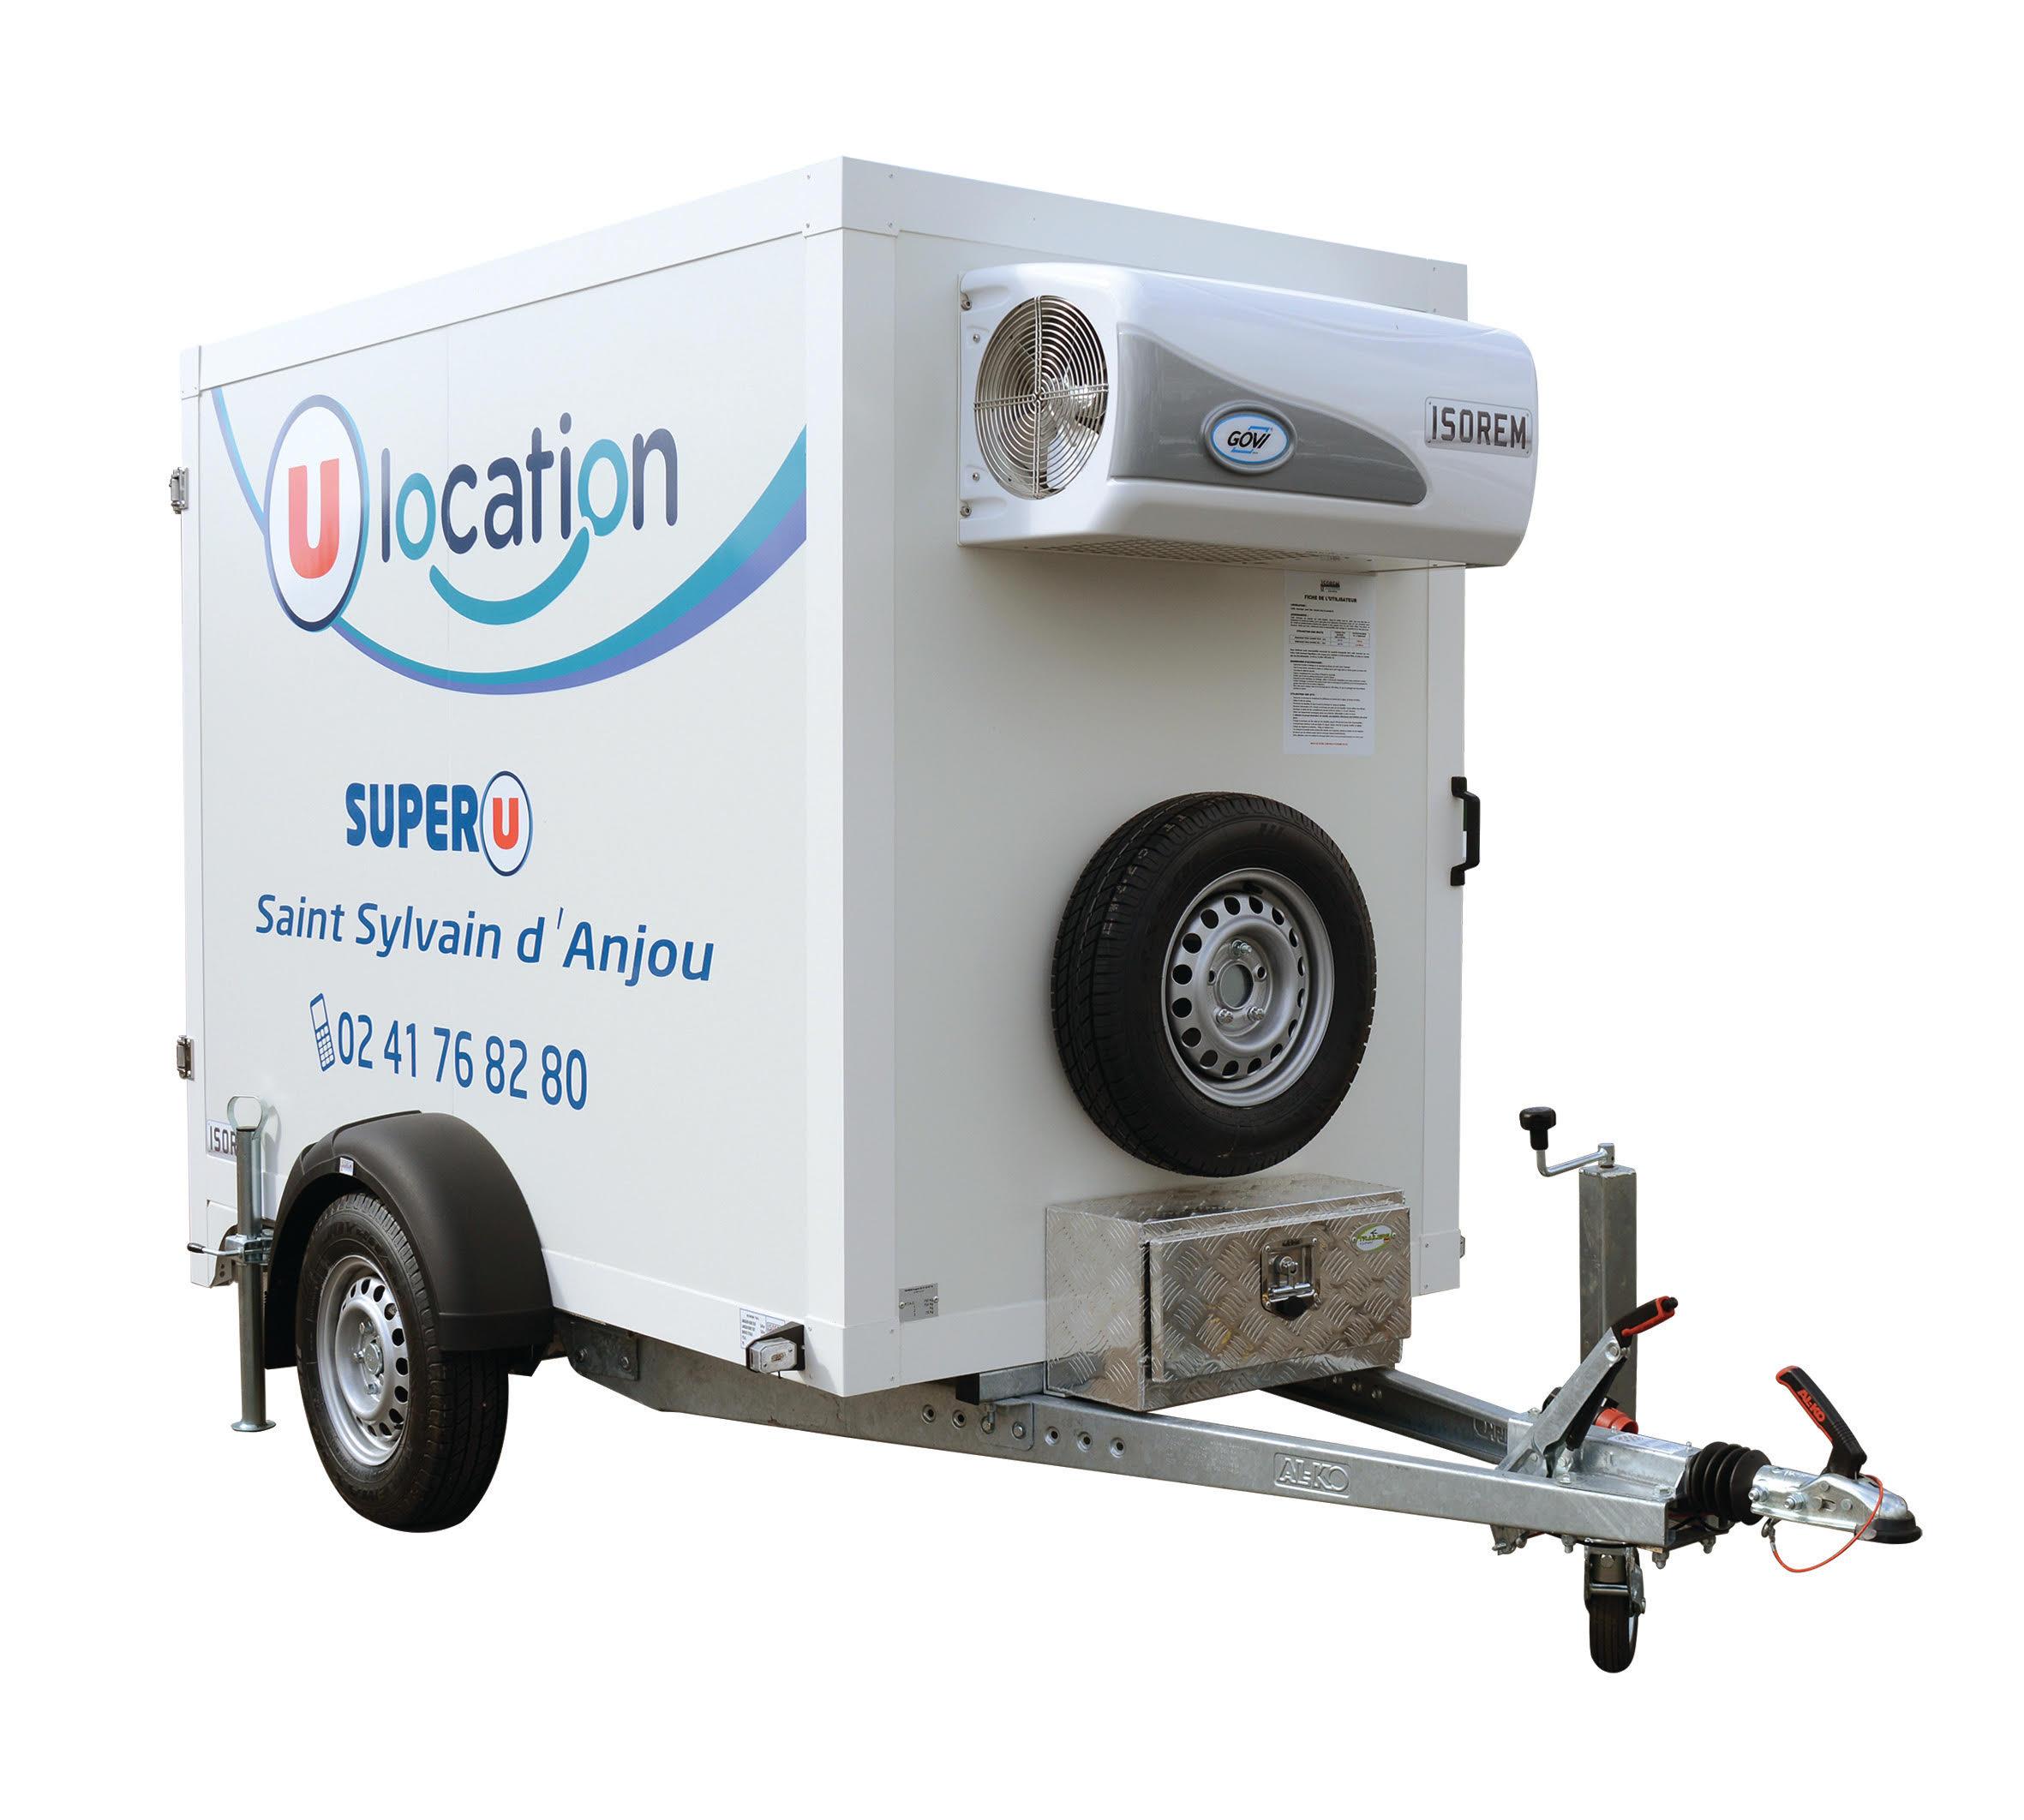 Location utilitaire Location u Super U MONDOUBLEAU Remorque frigo. 4-5 m3 - ISOREM (ou équivalent)